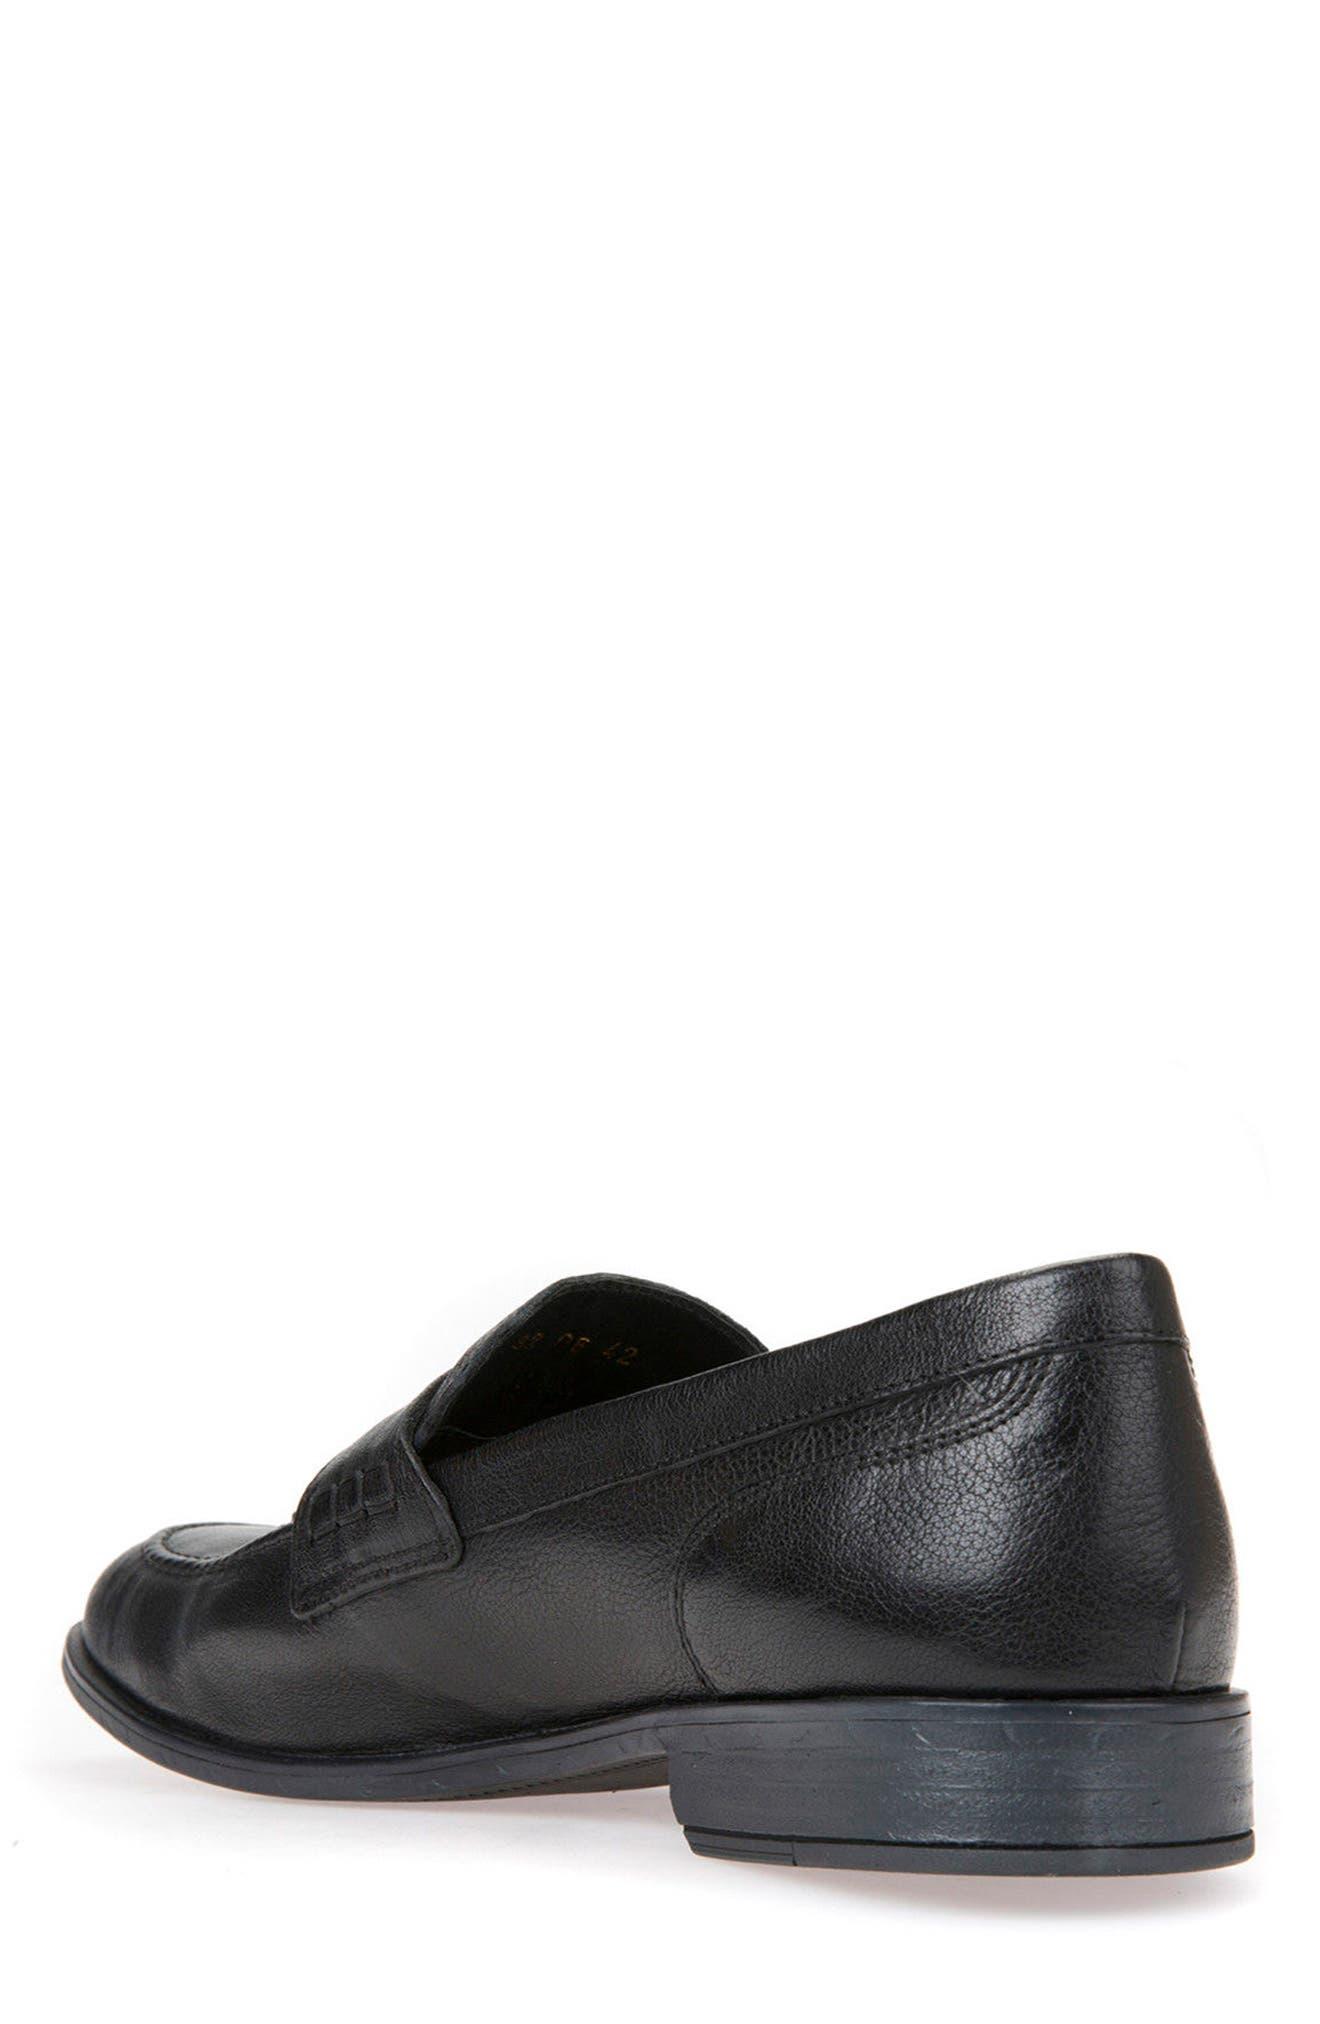 Bryceton 4 Tassel Loafer,                             Alternate thumbnail 2, color,                             BLACK LEATHER